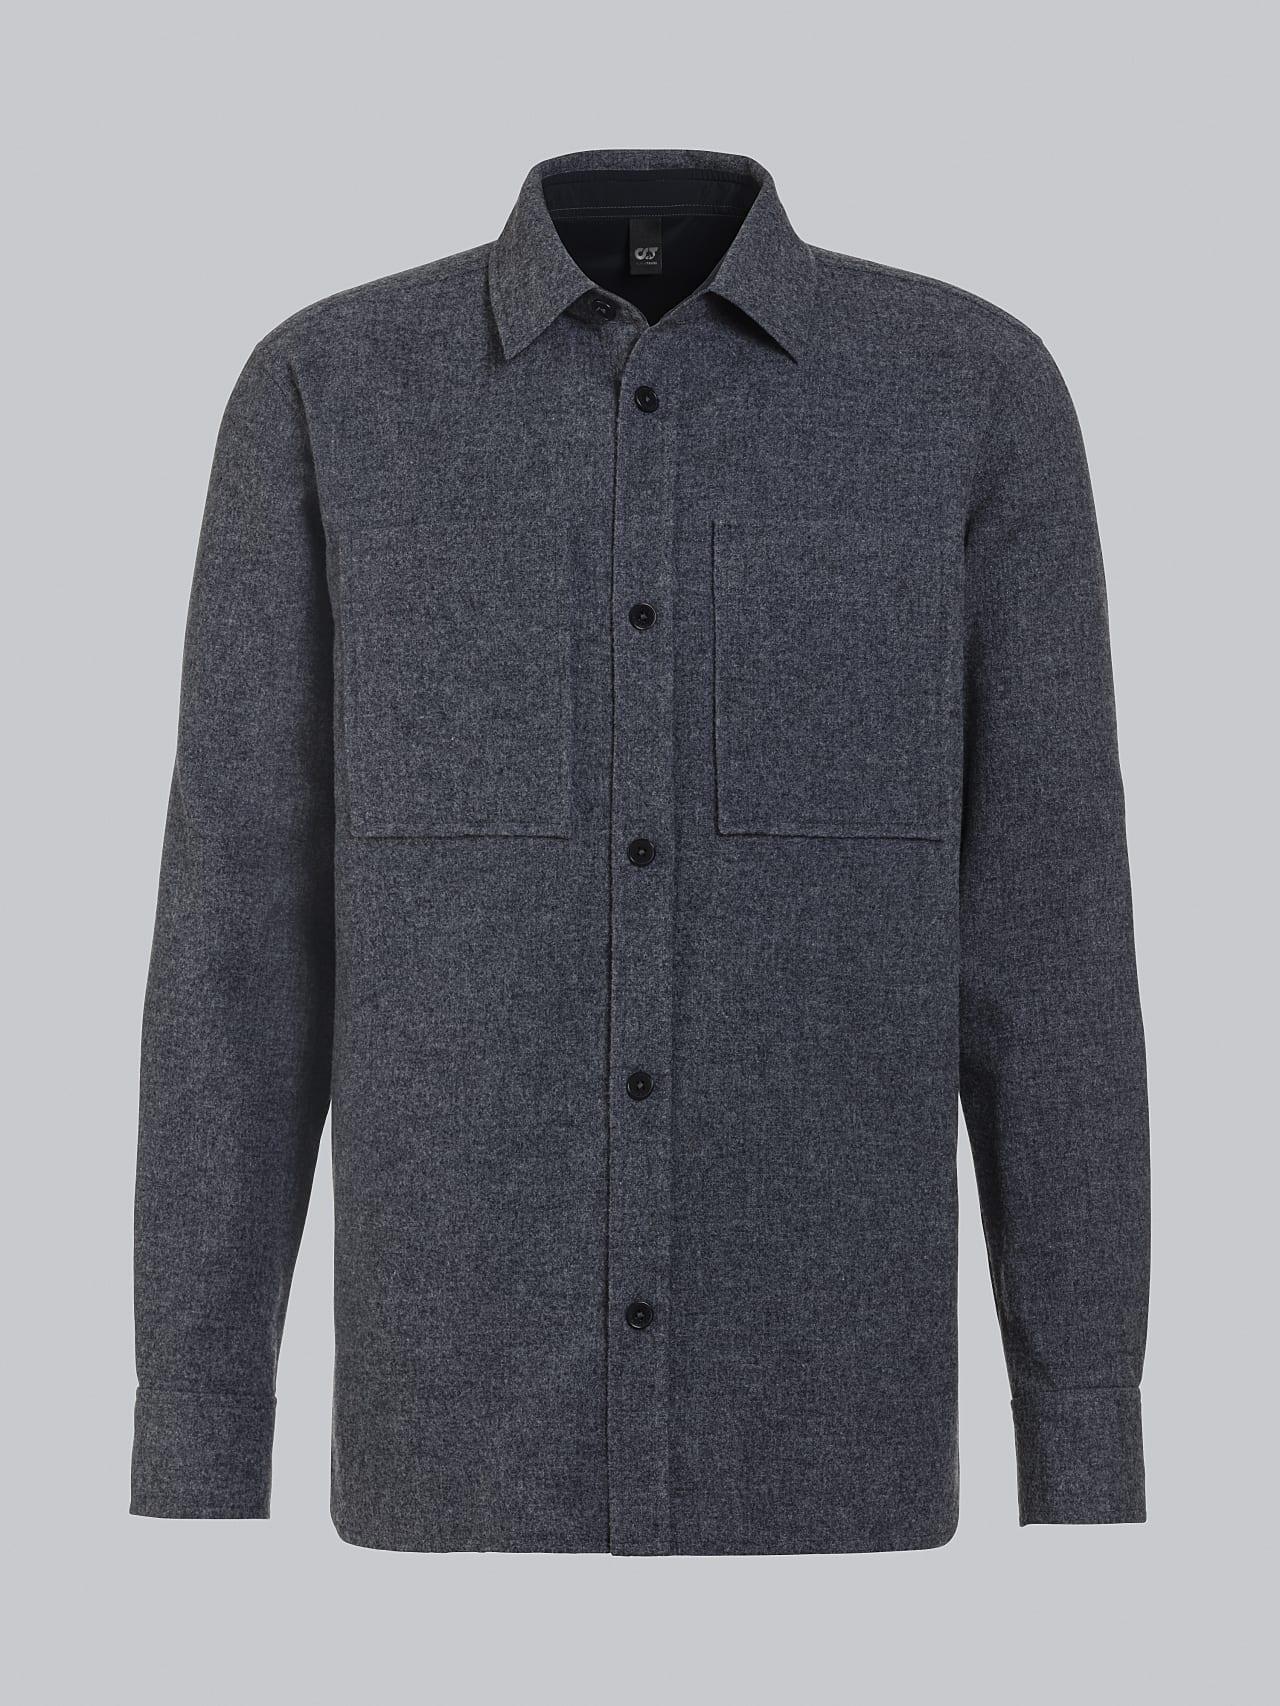 WOVER V1.Y5.02 Wool Over-Shirt navy Back Alpha Tauri